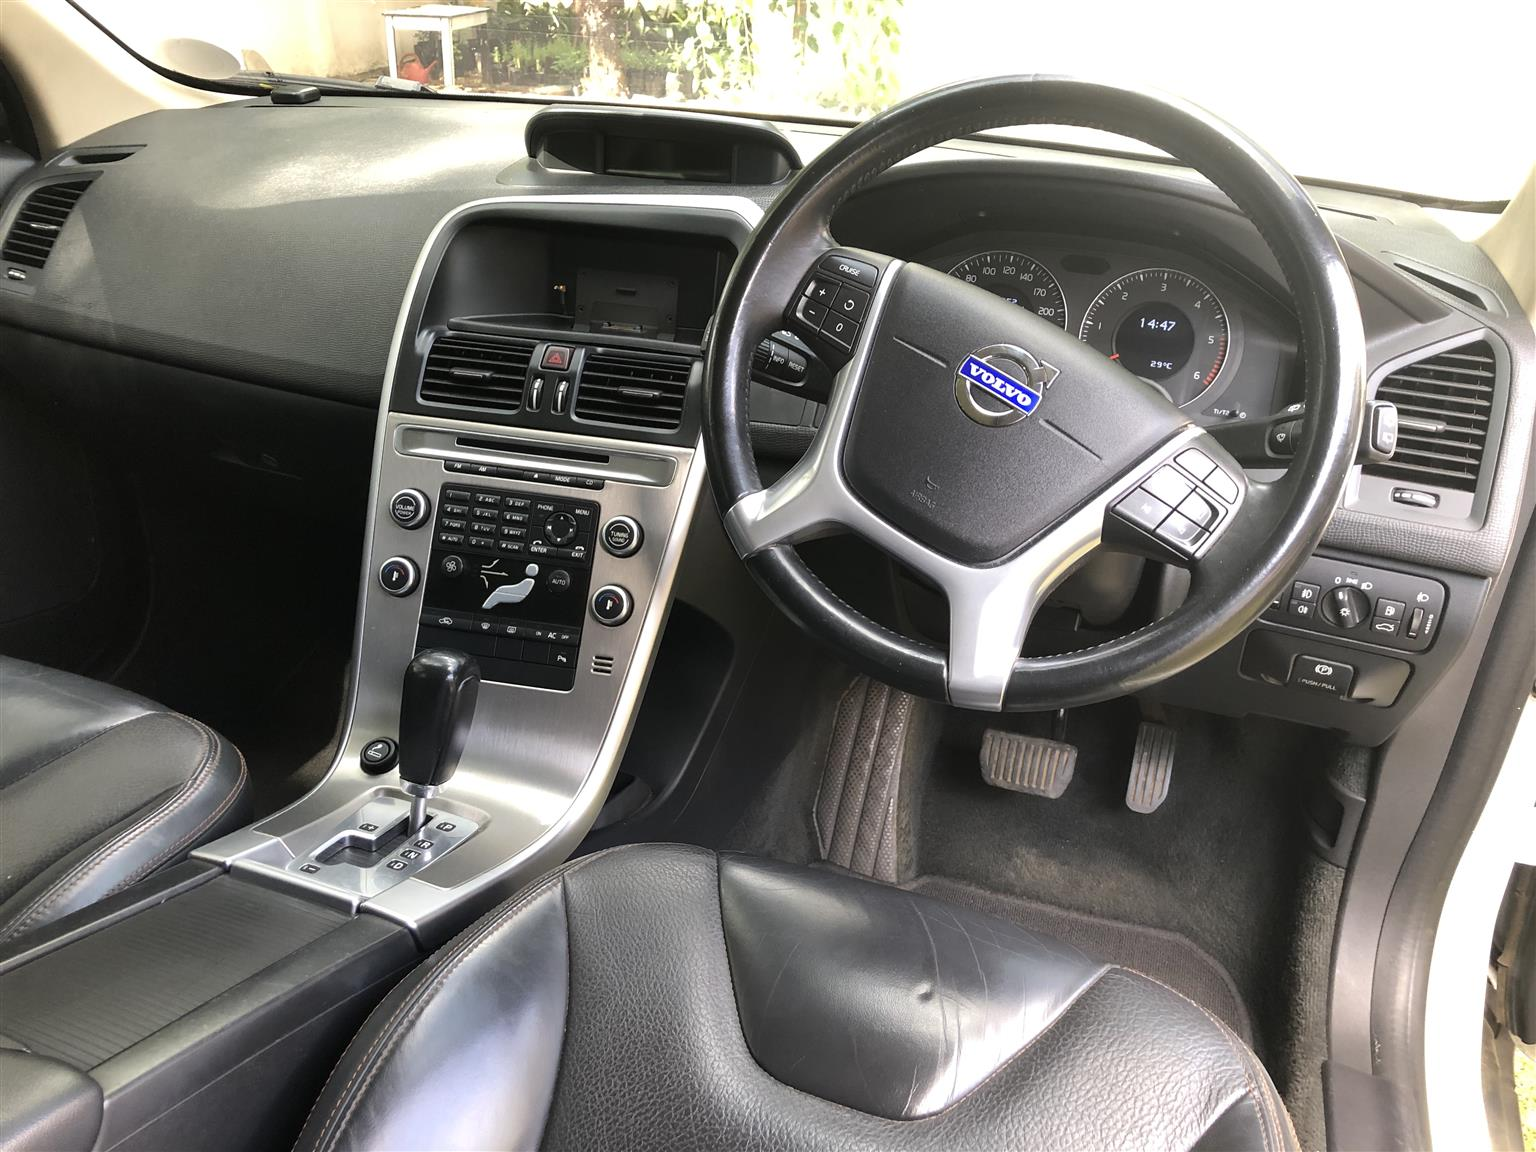 2010 Volvo XC60 2.4D DRIVe